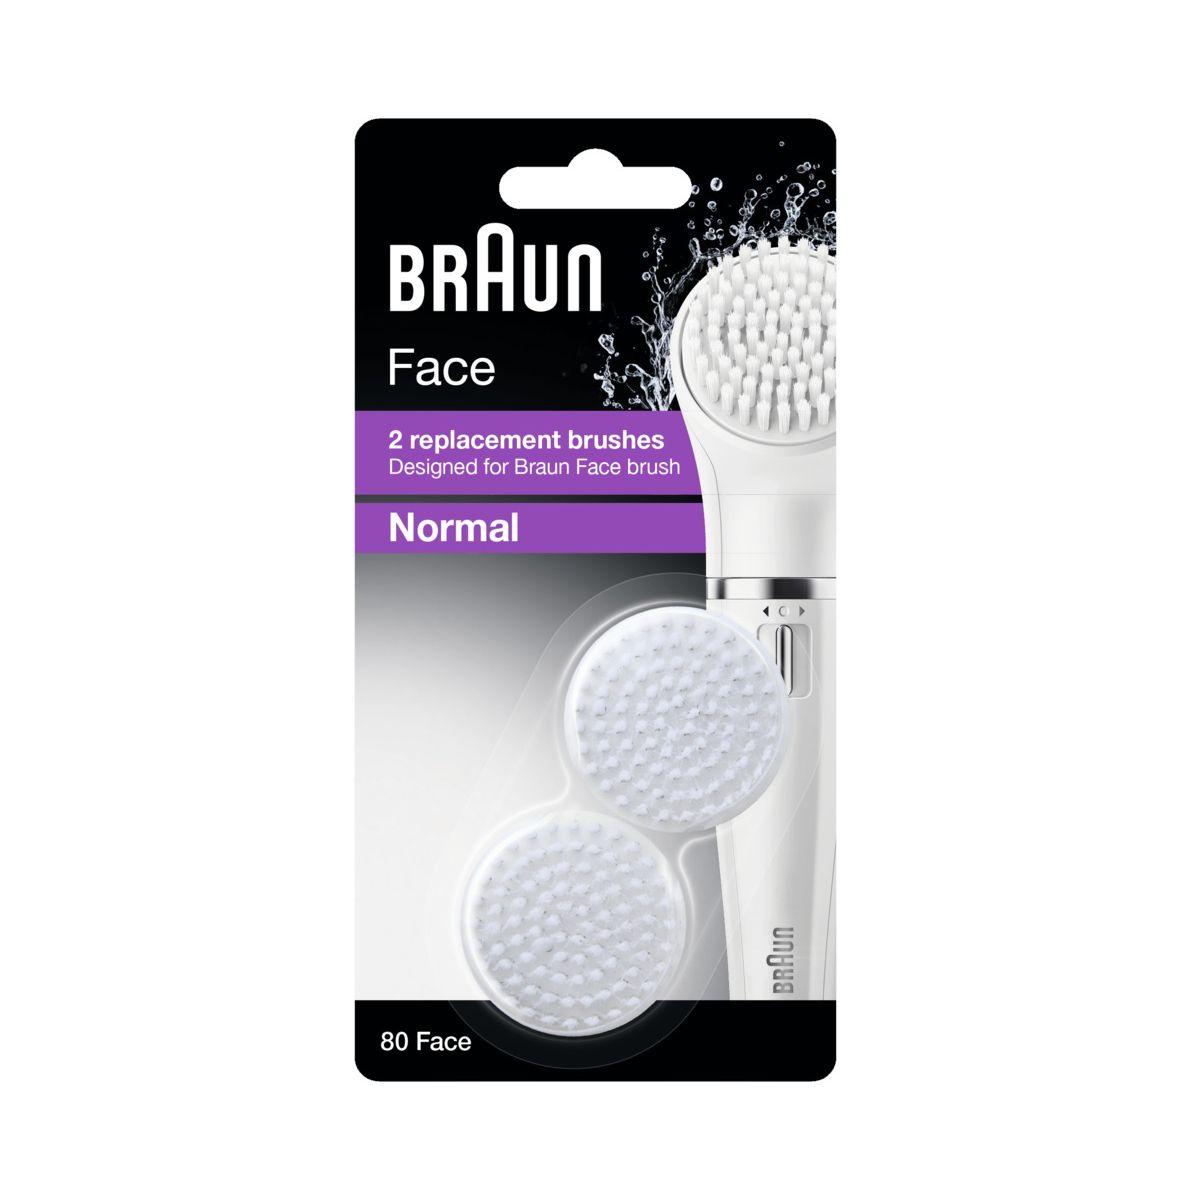 Brossette de rechange BRAUN Rech nettoyage visage SE80 (photo)